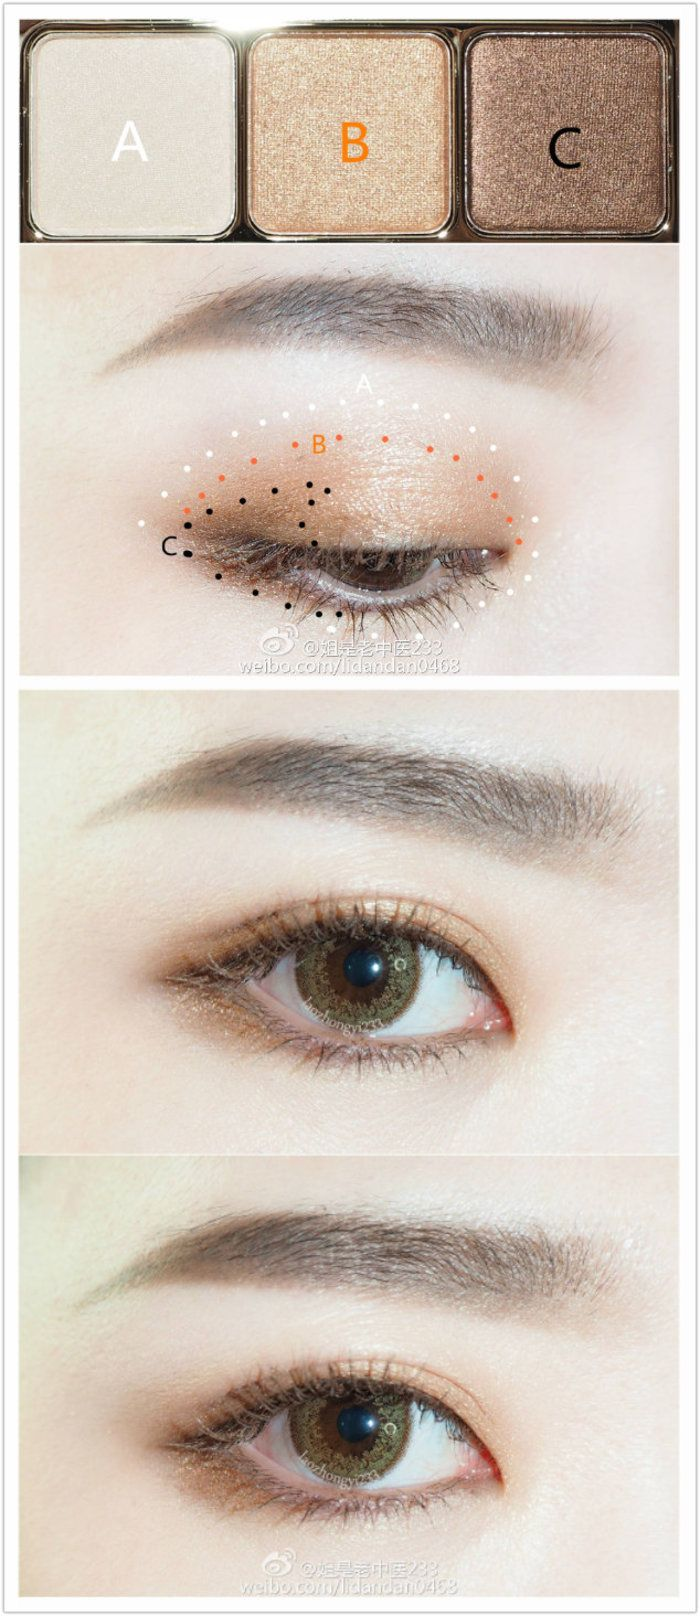 natural makeup tutorial for blue eyes